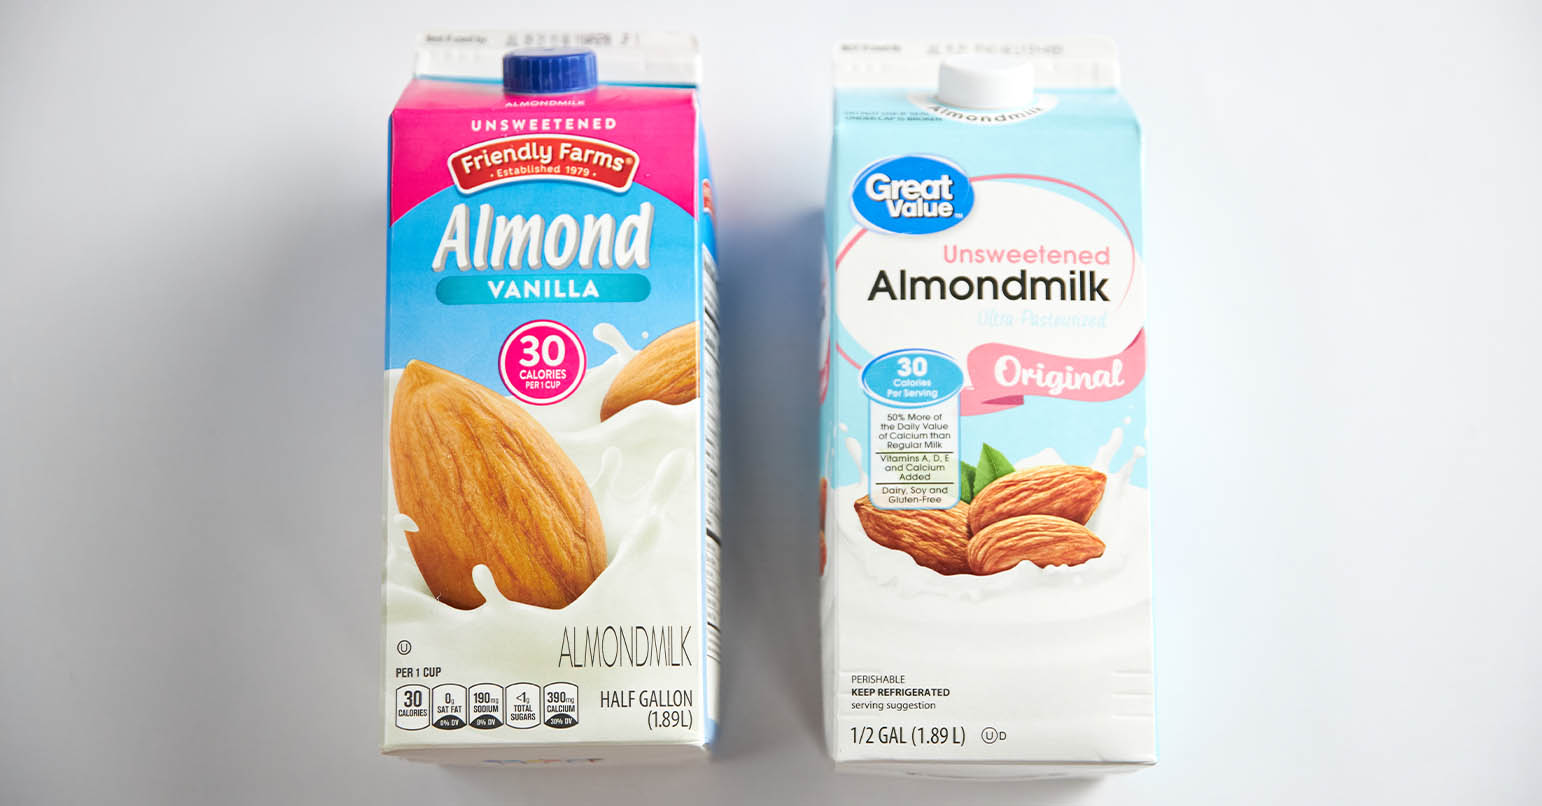 Aldi vs Walmart Almond Milk